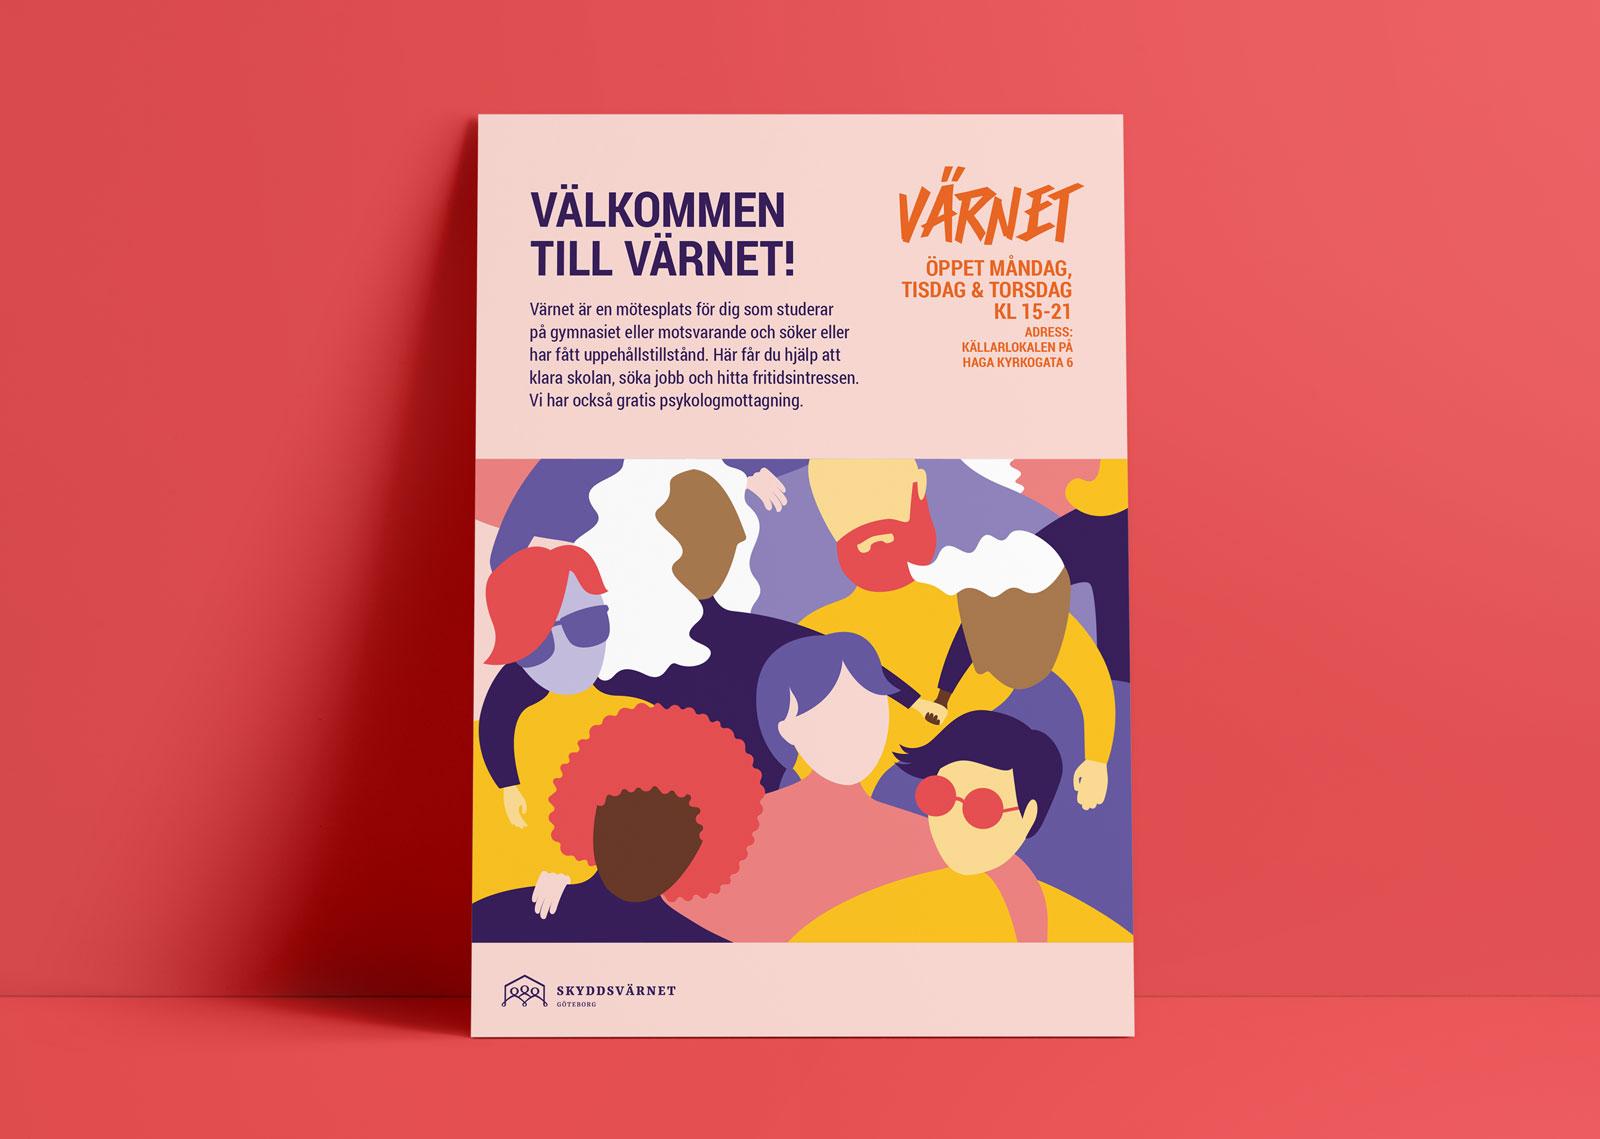 Varnet_poster-Mia_Olofsson